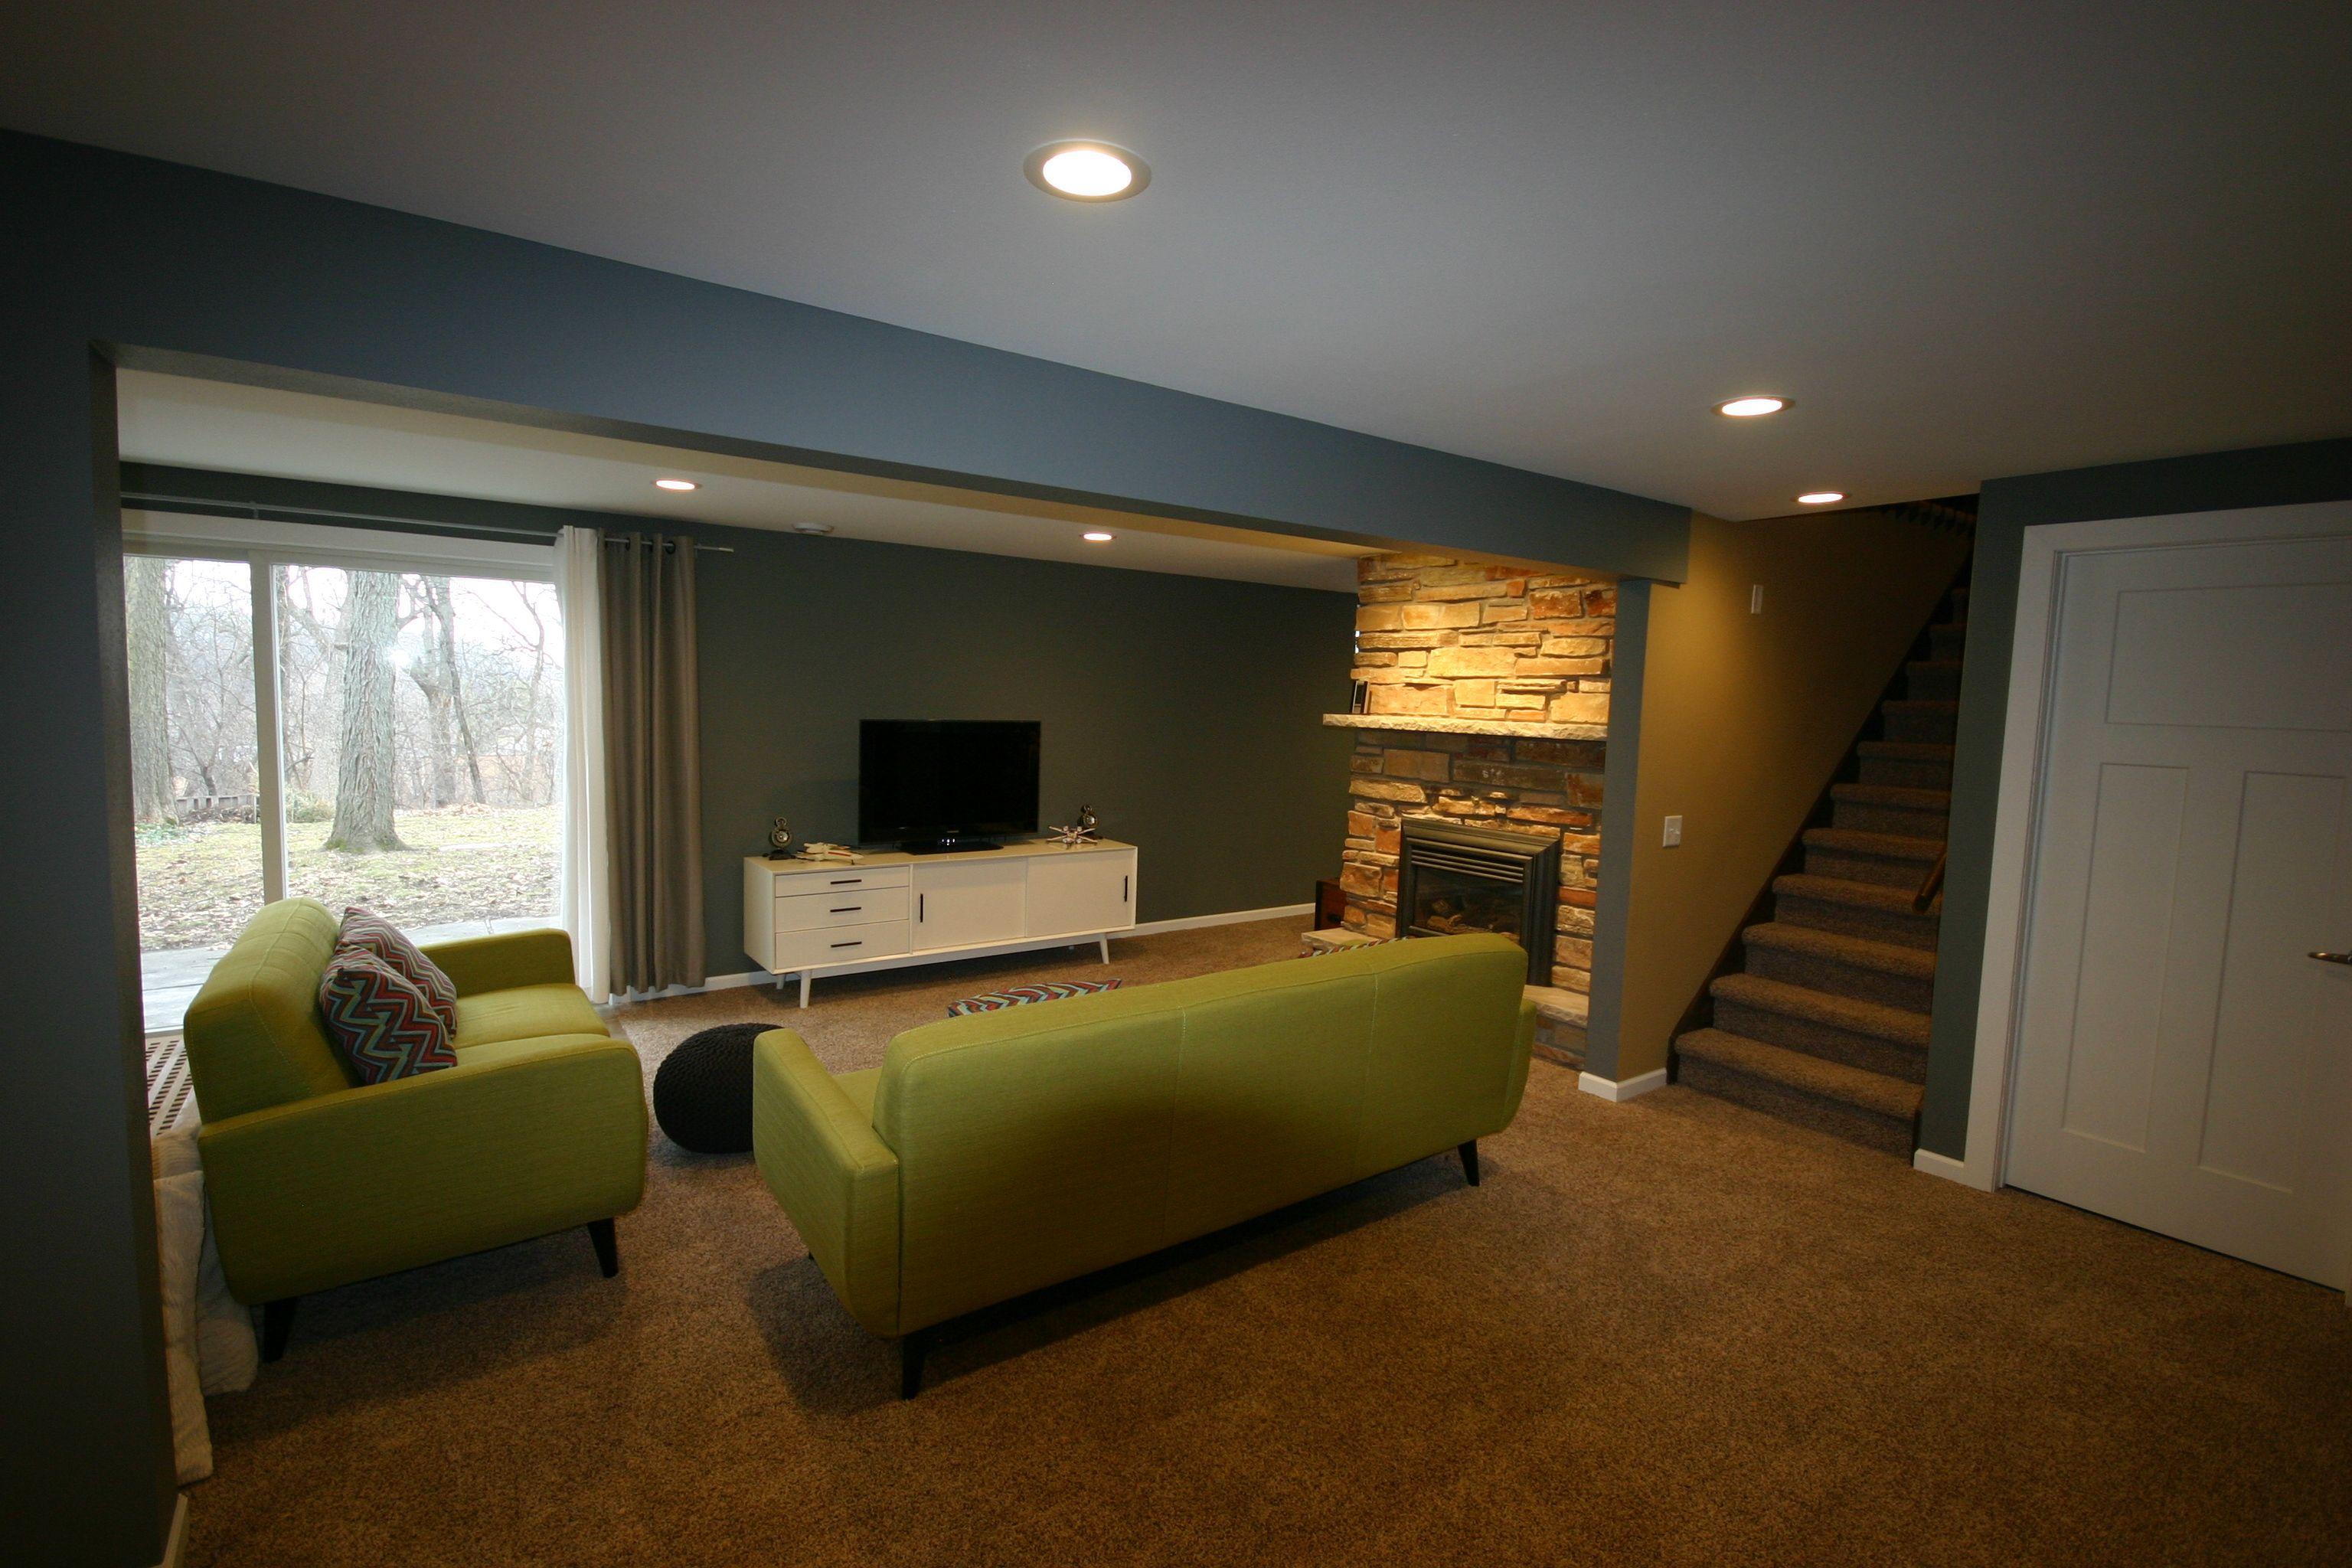 Basement Lighting Recessed Ceiling: Simple Basement, Carpeting, Drywall Ceiling, Recessed